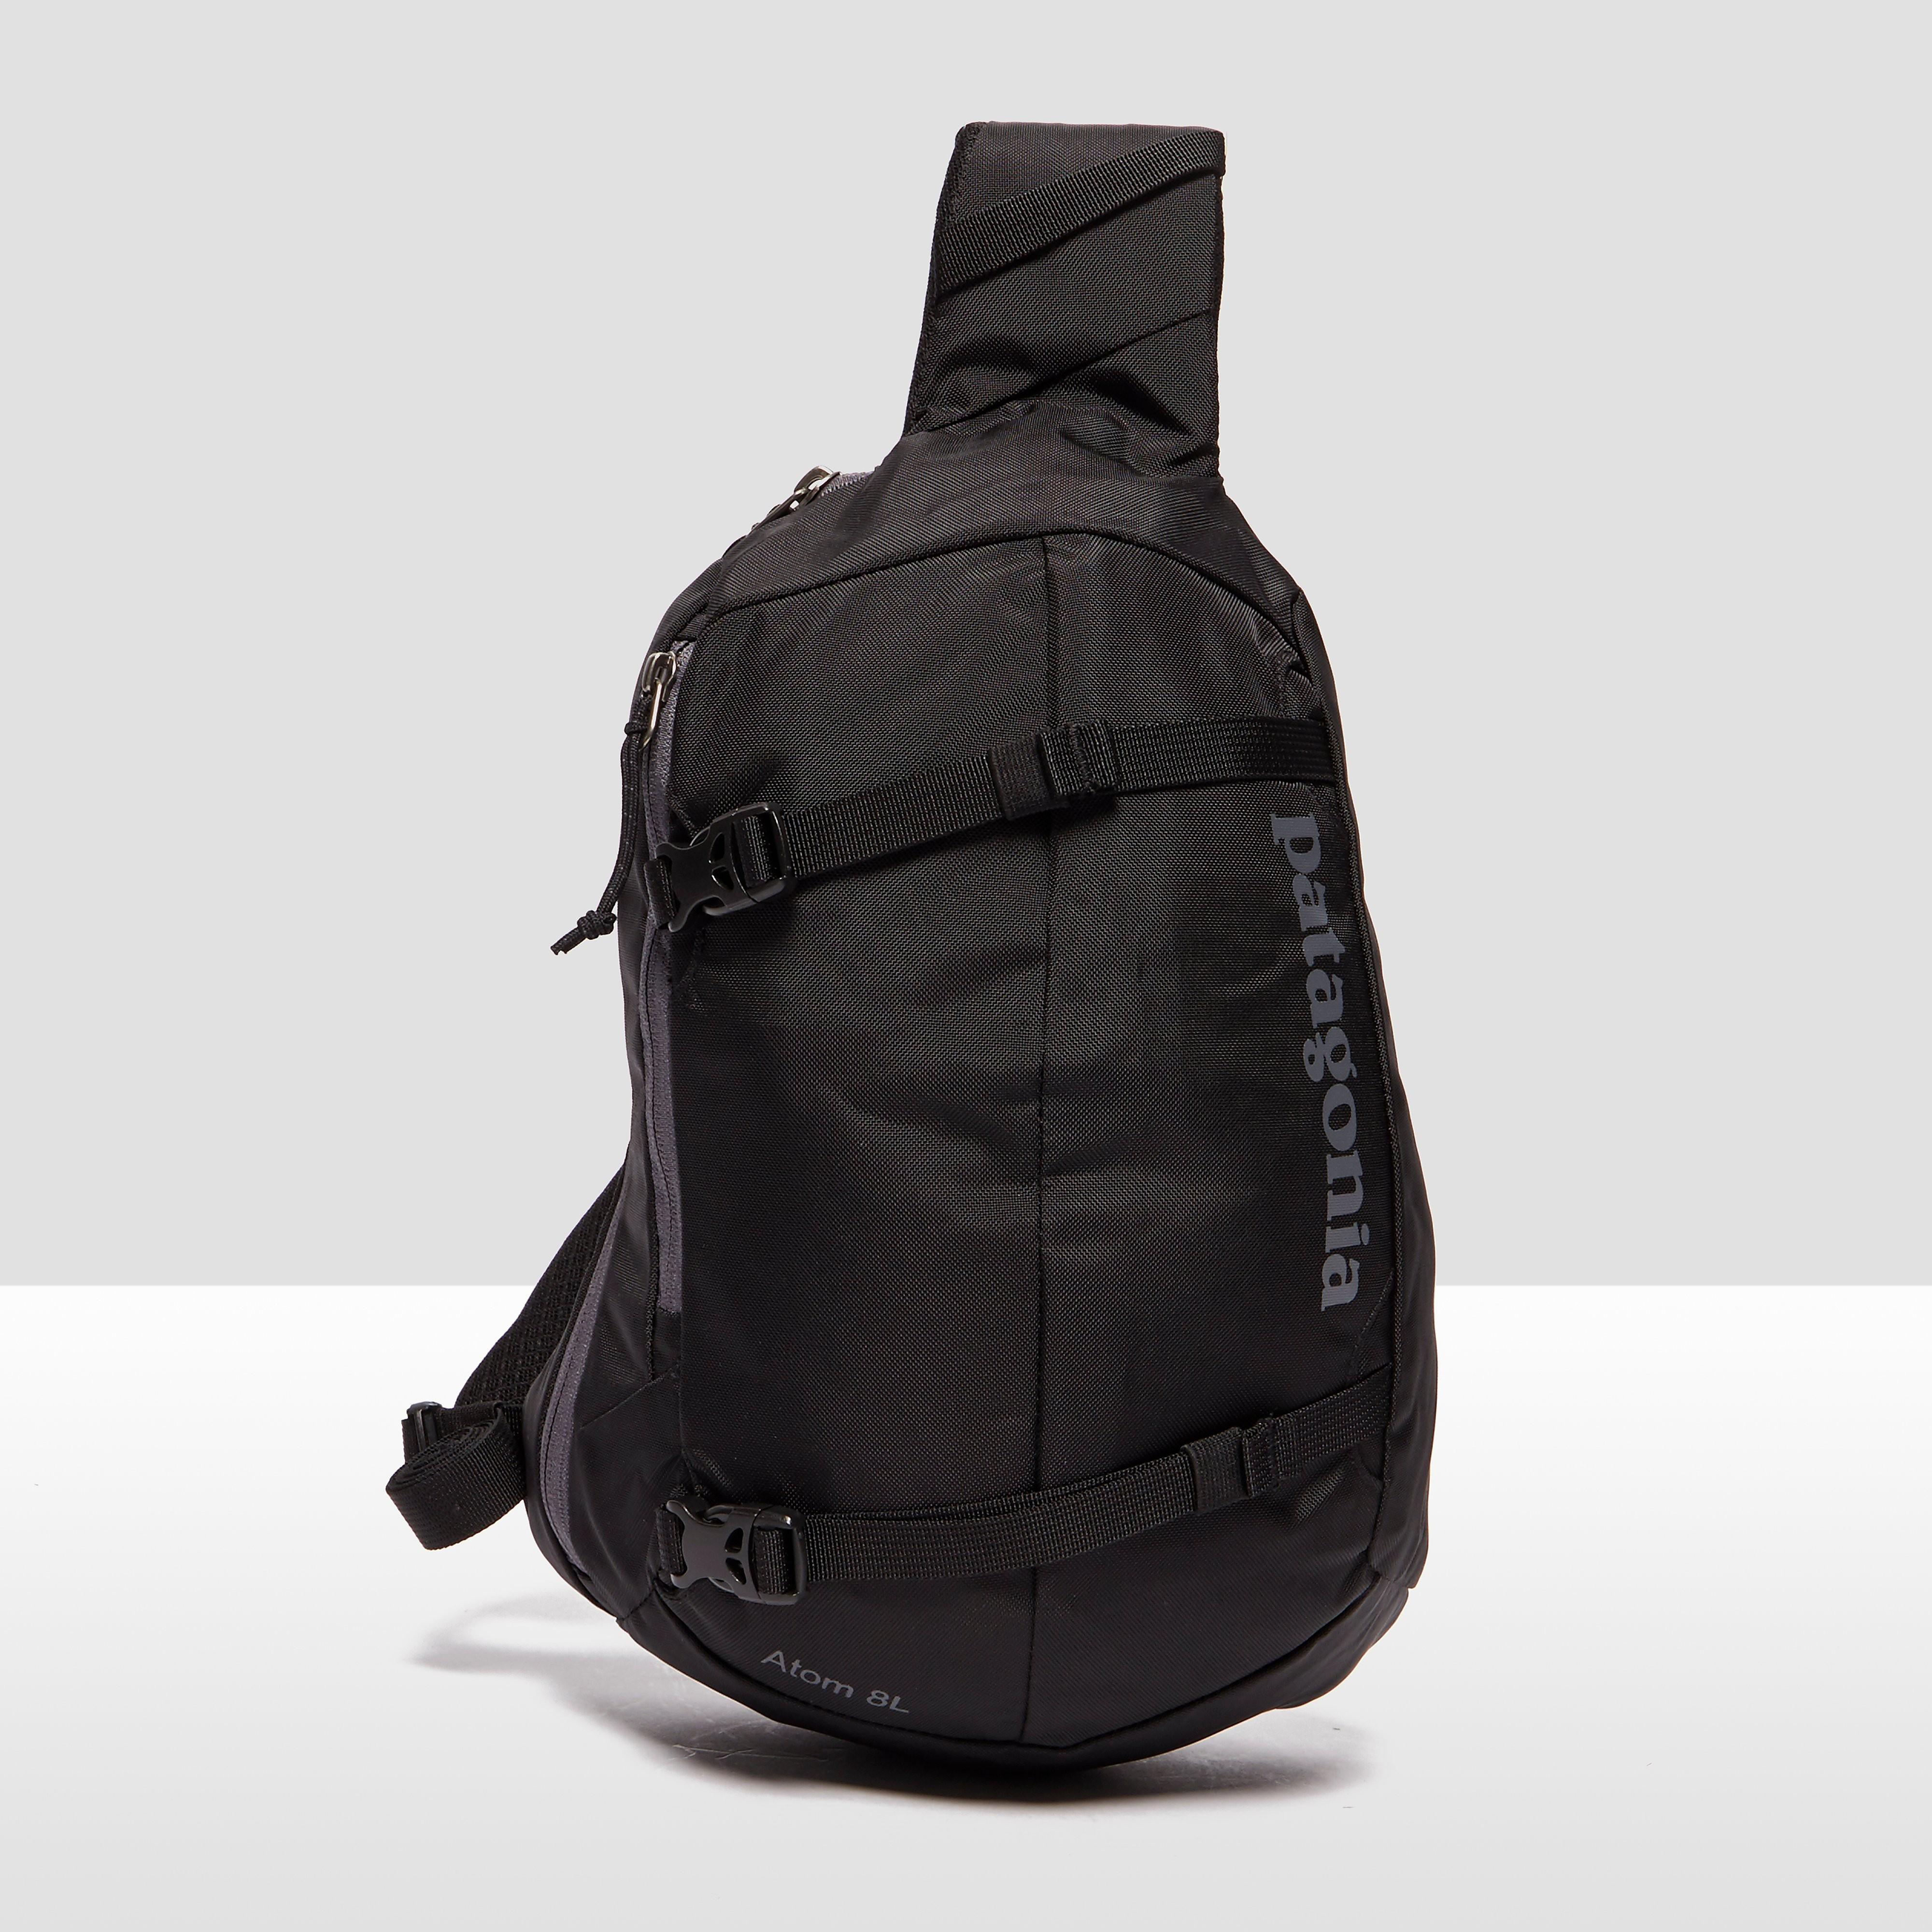 Patagonia Atom Sling 8L Bag